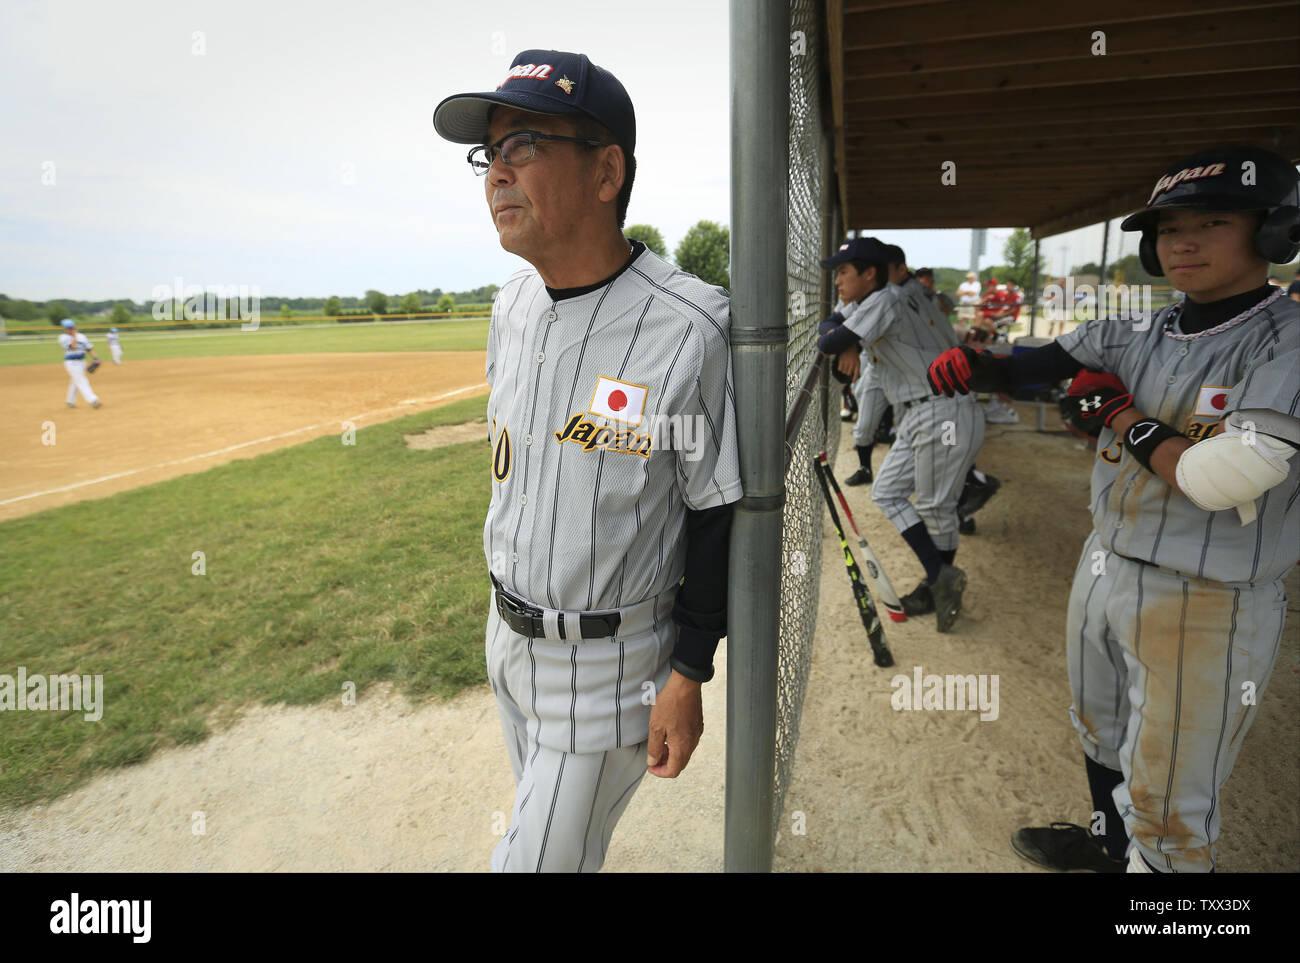 Japan coach Sadao Nakashiro (L) watches from the bench as